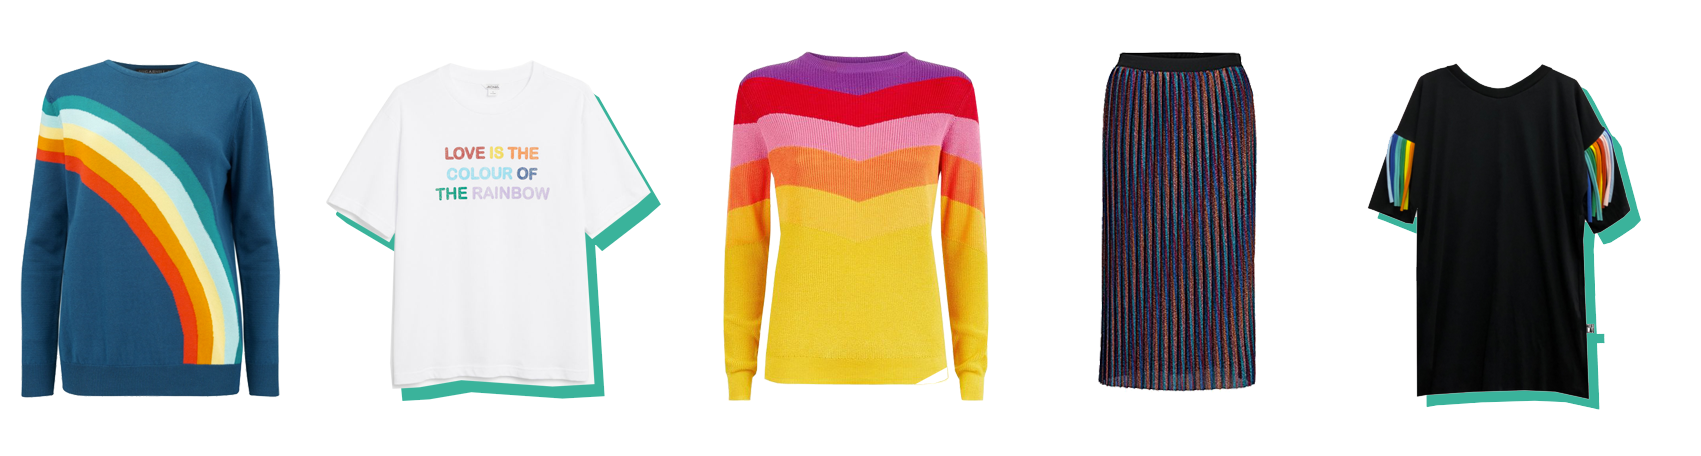 How to wear Rainbow